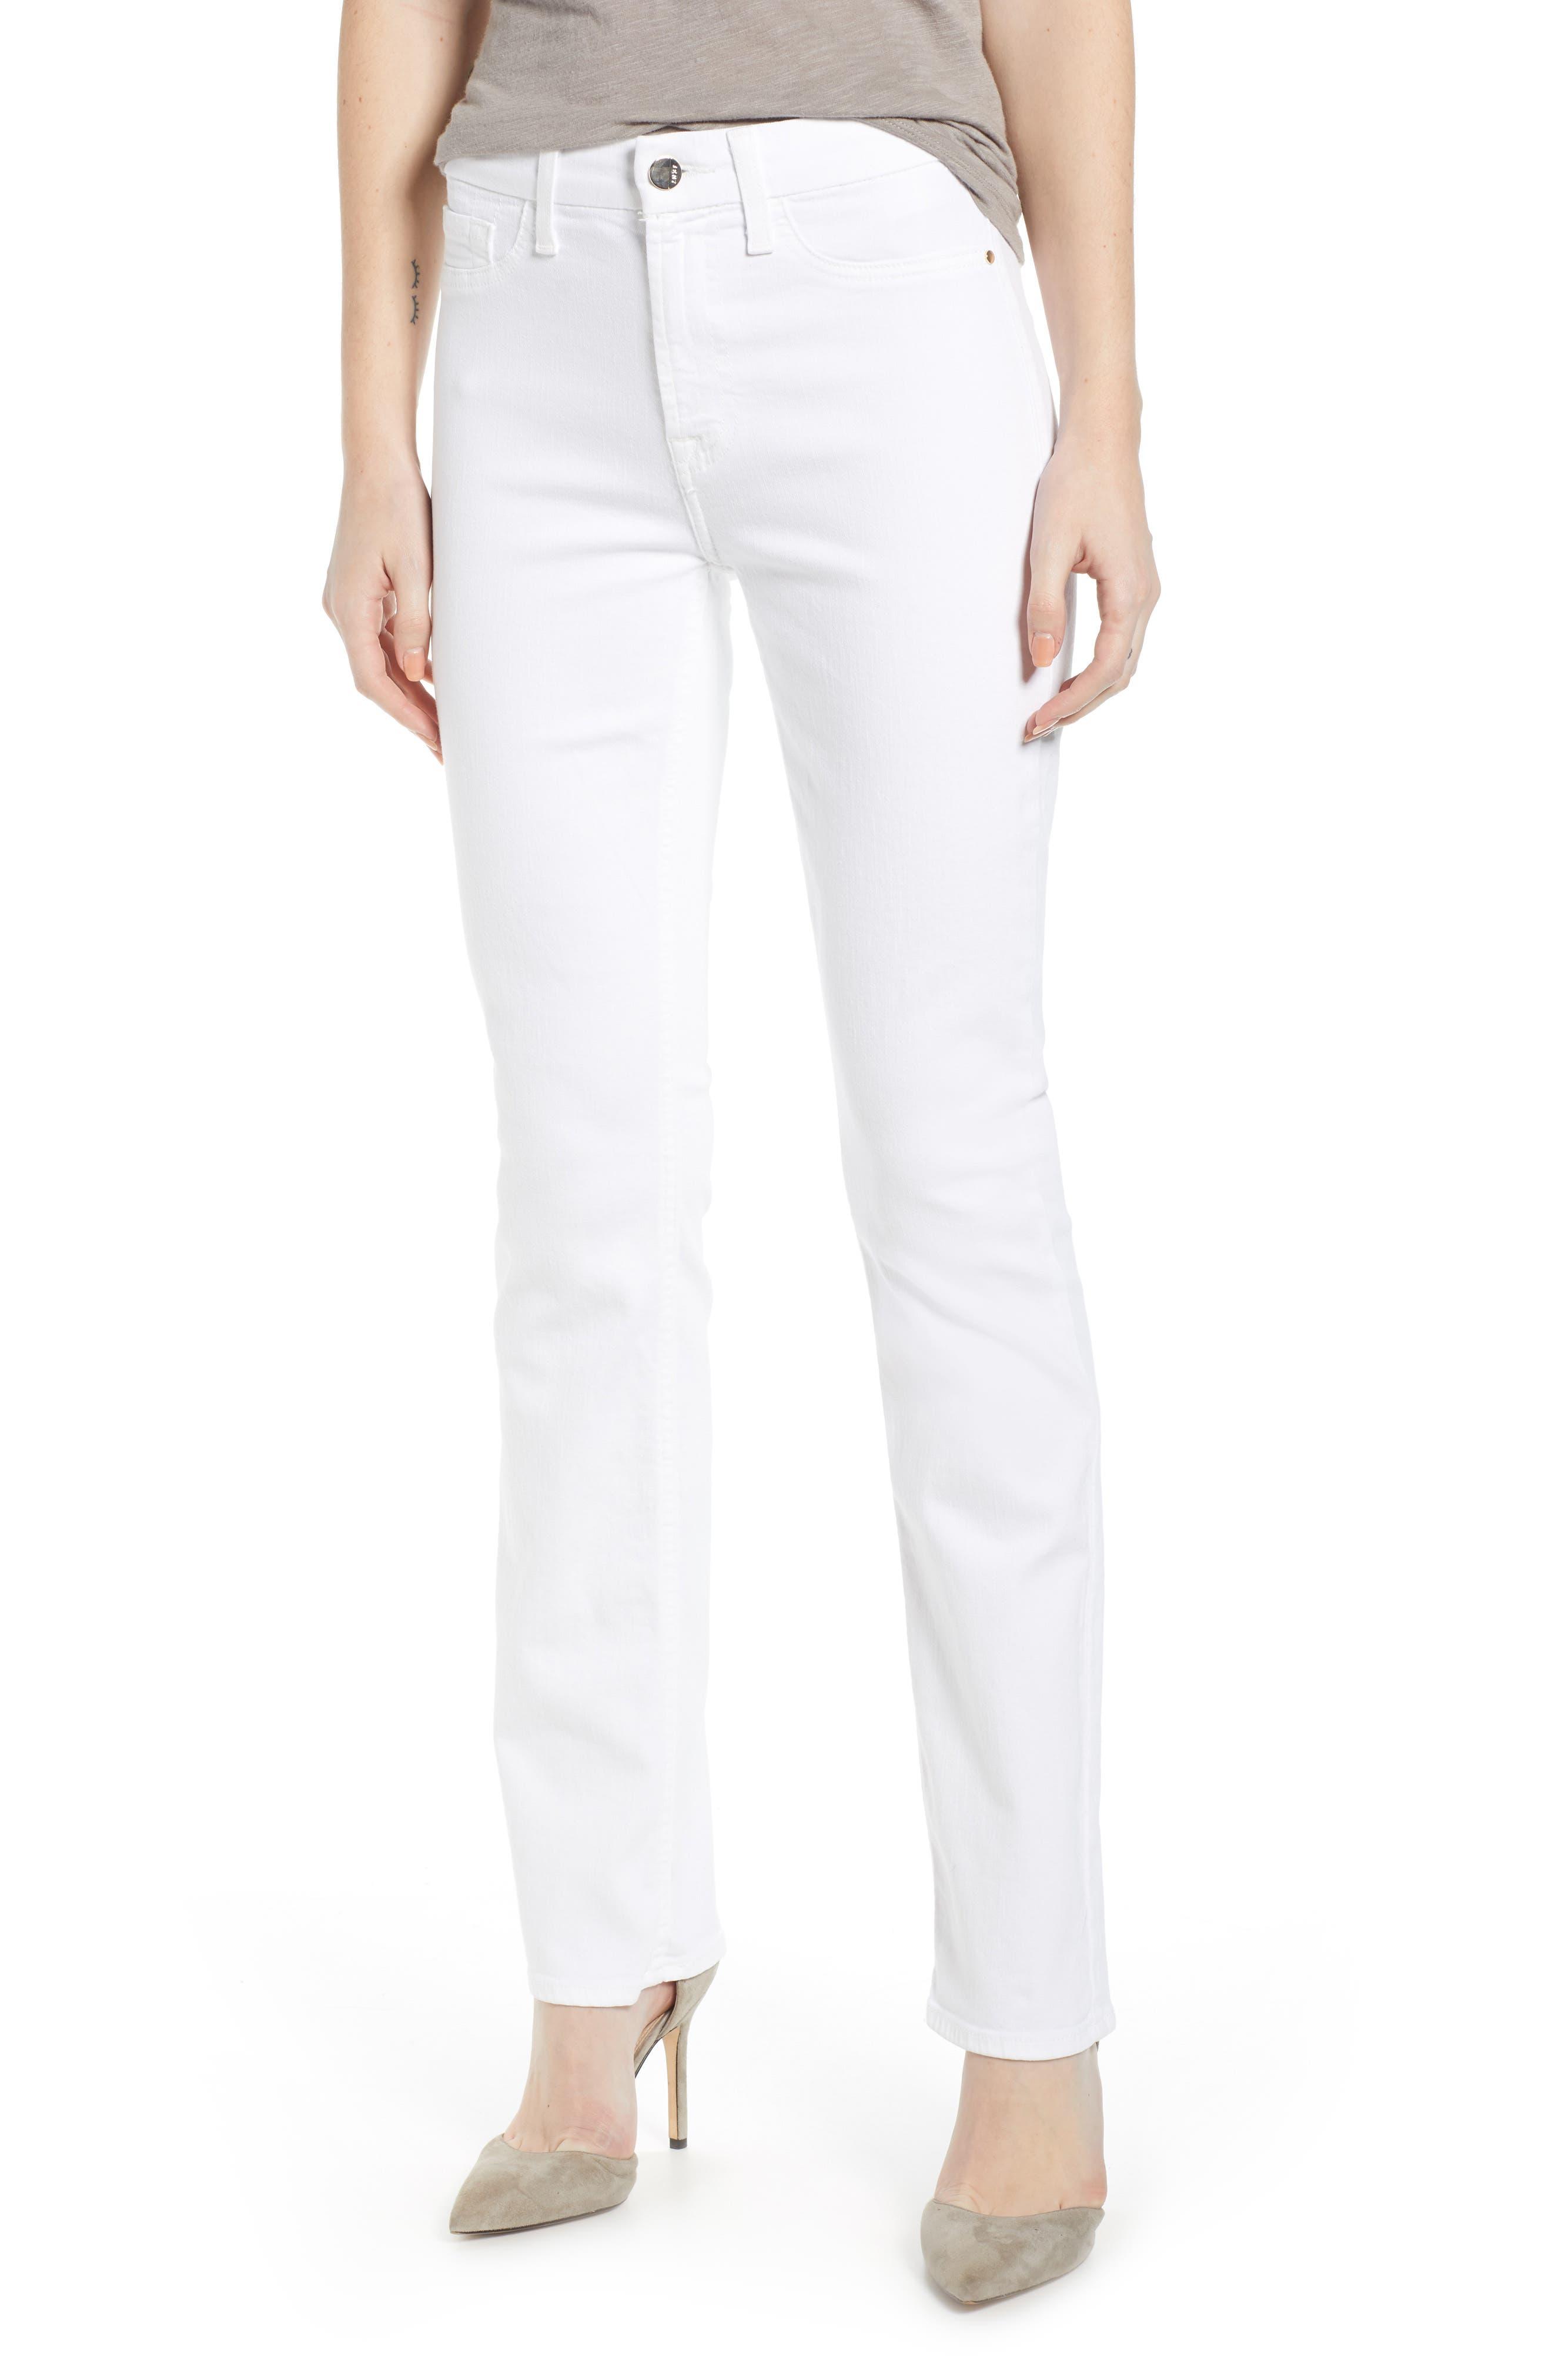 Women's Jen7 By 7 For All Mankind Slim Straight Leg Jeans